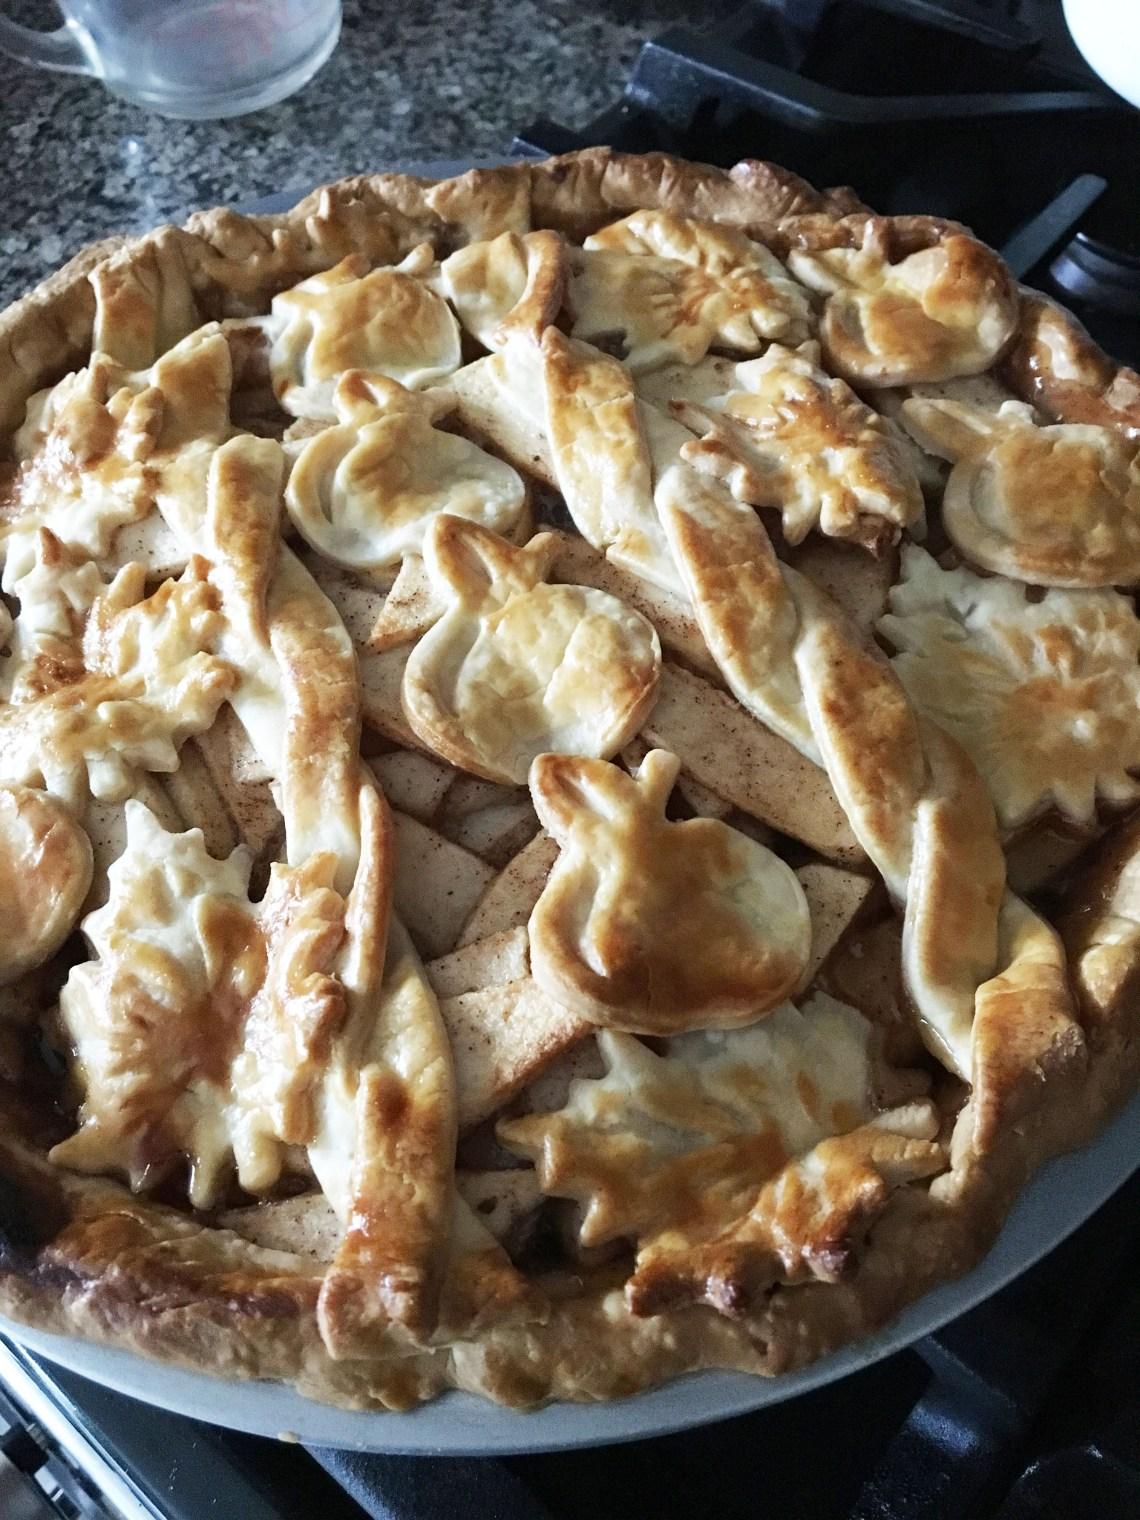 Apple Pie - Cutouts & Braided Lattice